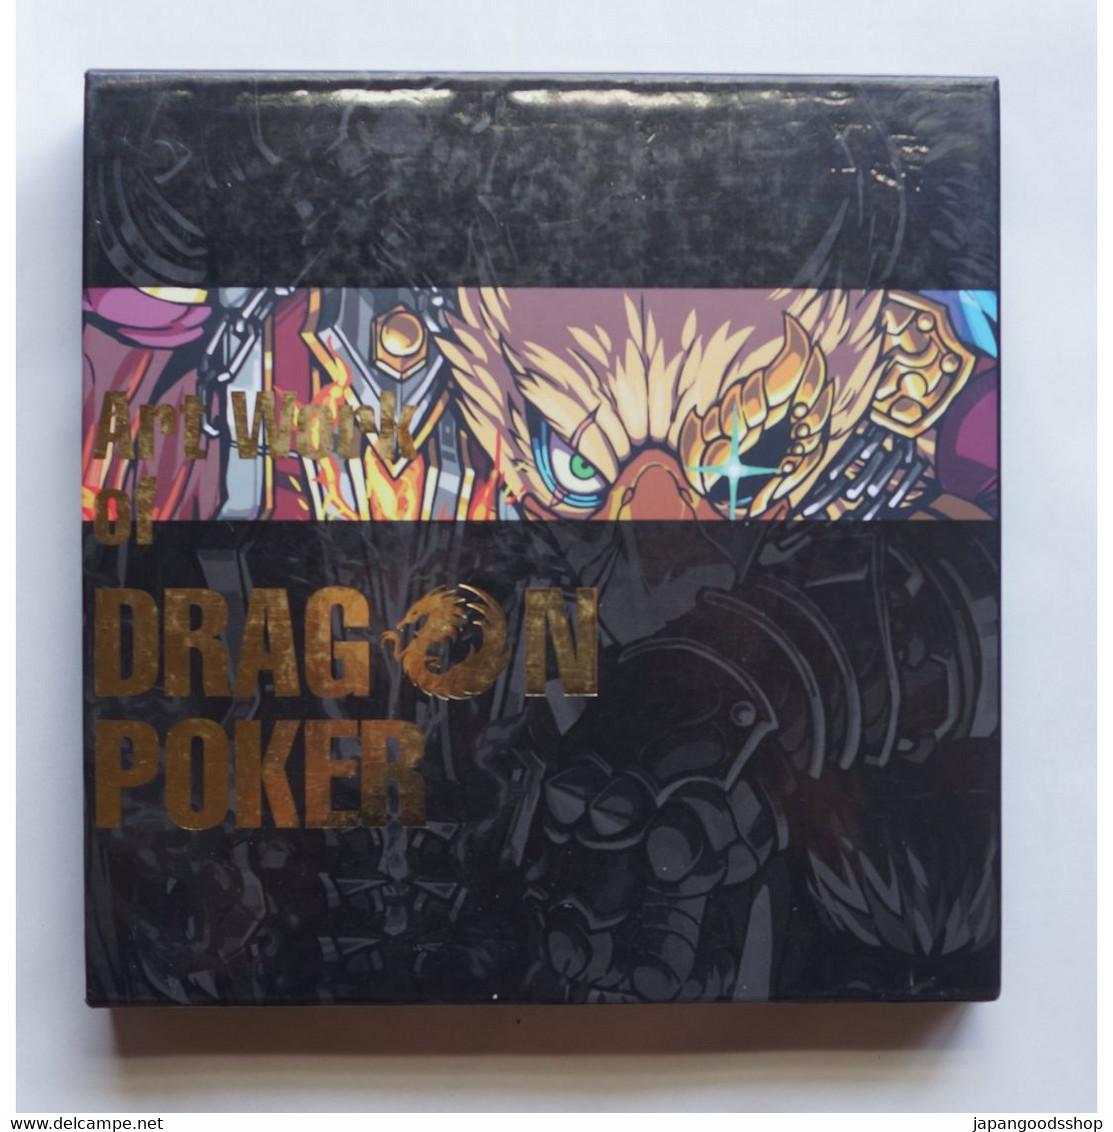 Art Work Of Dragon Poker - Other